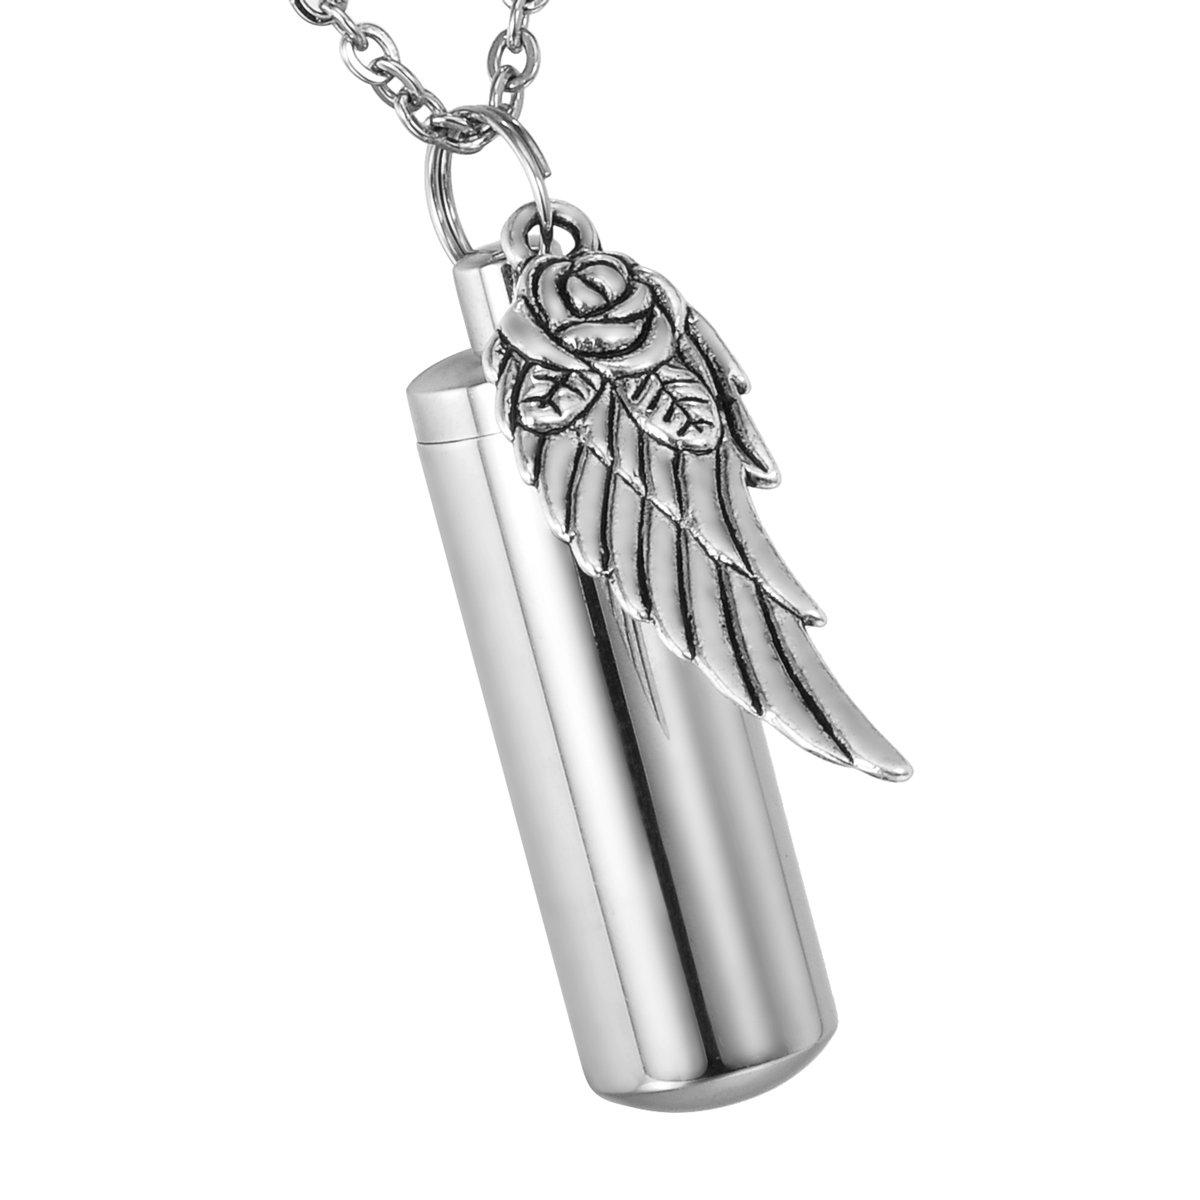 HooAMI Rose Flower Angel Wing Charm Memorial Urn Necklace Cremation Ashes Keepsake Pendant